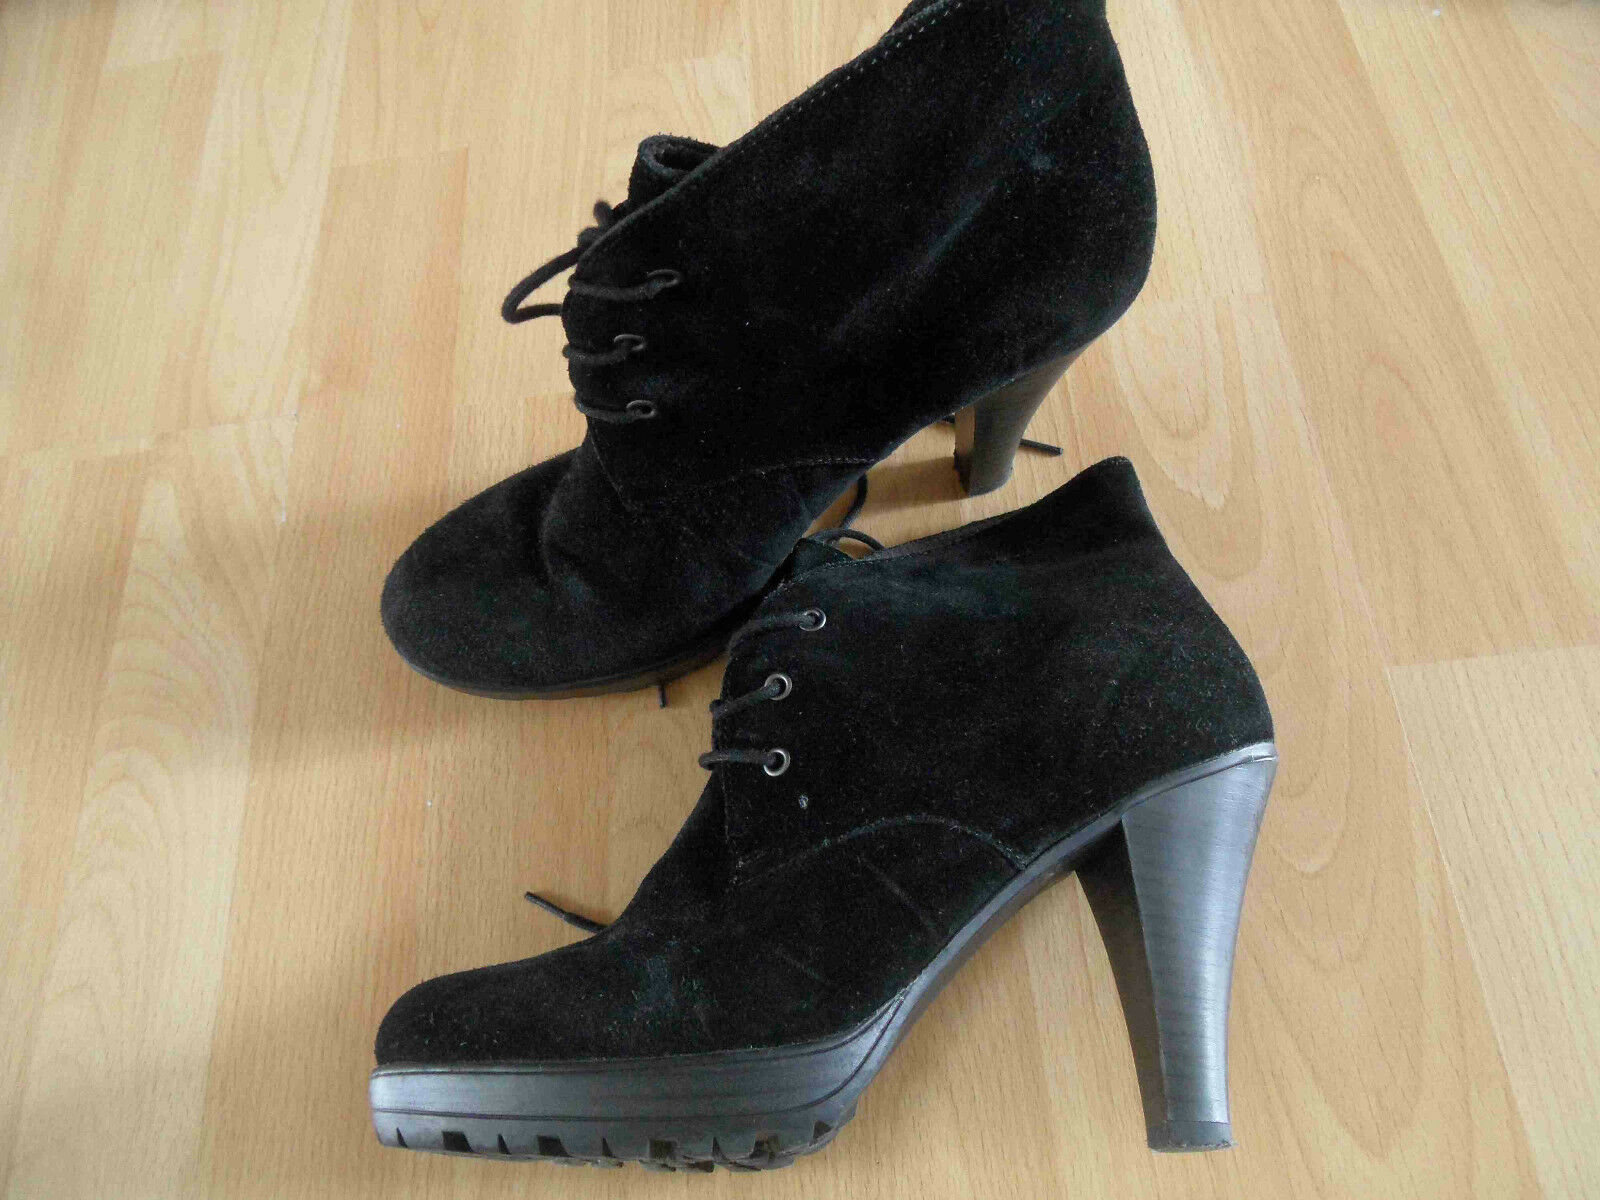 TAMARIS High Heels 41 Ankle Stiefel schwarz Wildleder Gr. 41 Heels TOP (KB814) 5fab4e